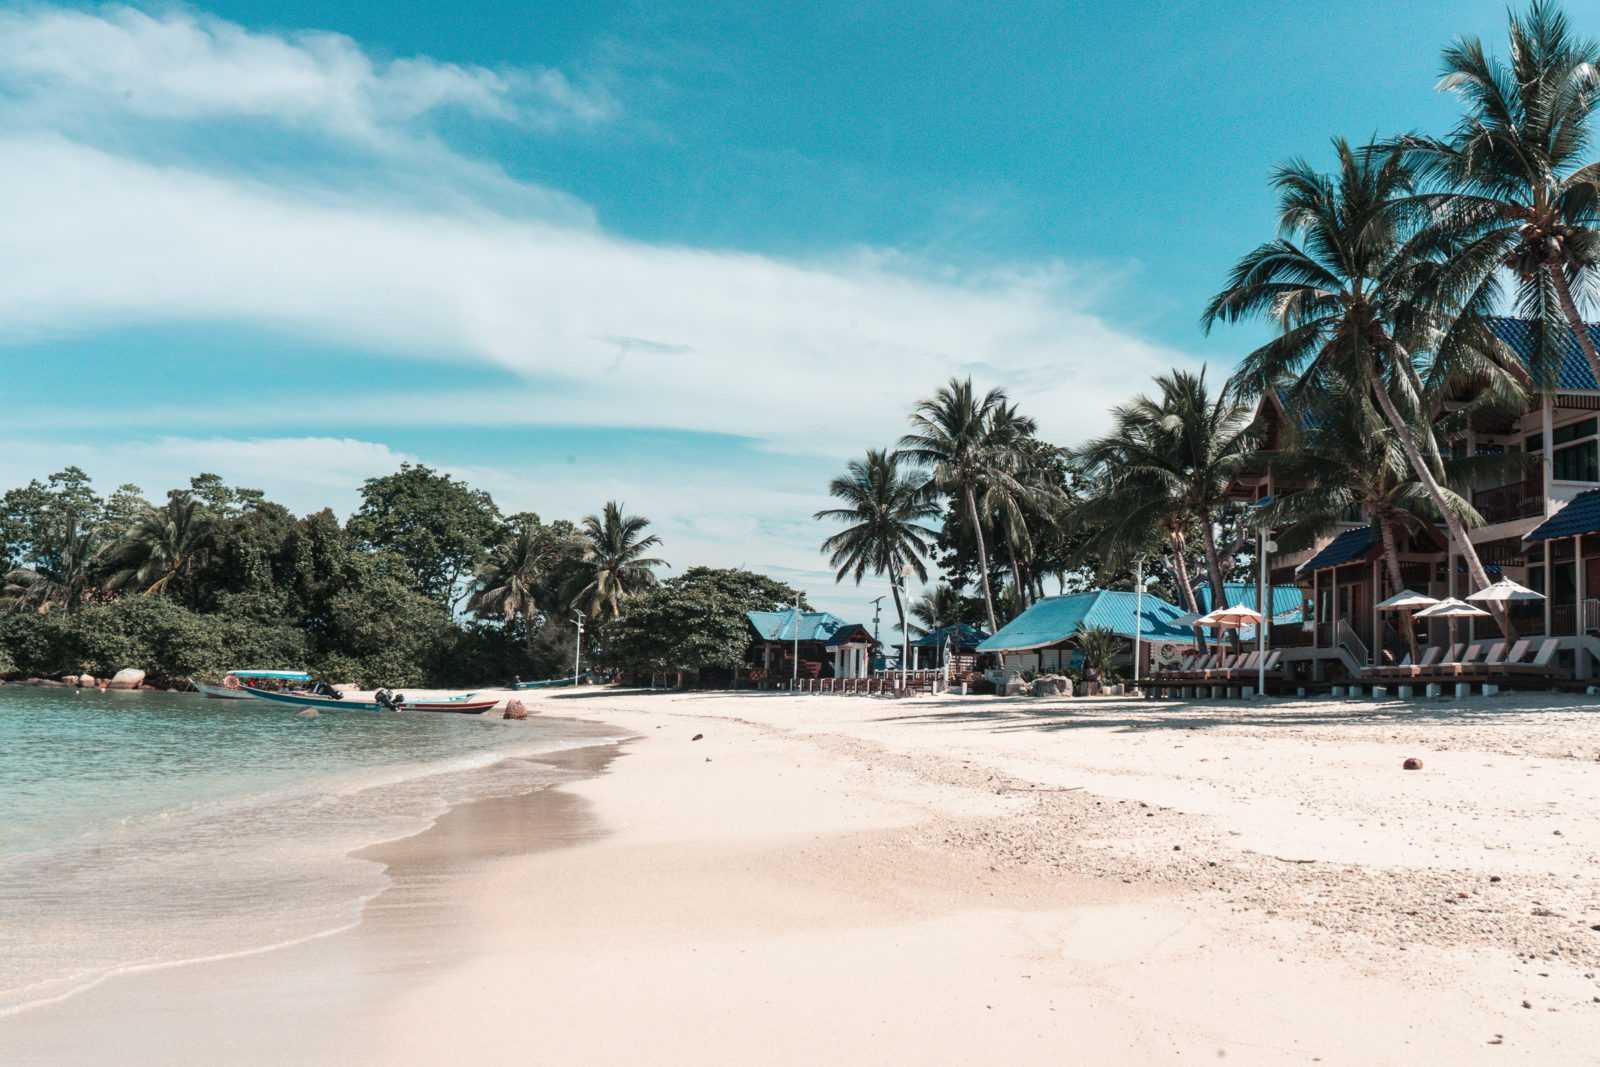 Perhentian Islands Pulau Perhentian Besar Malaysia Strand